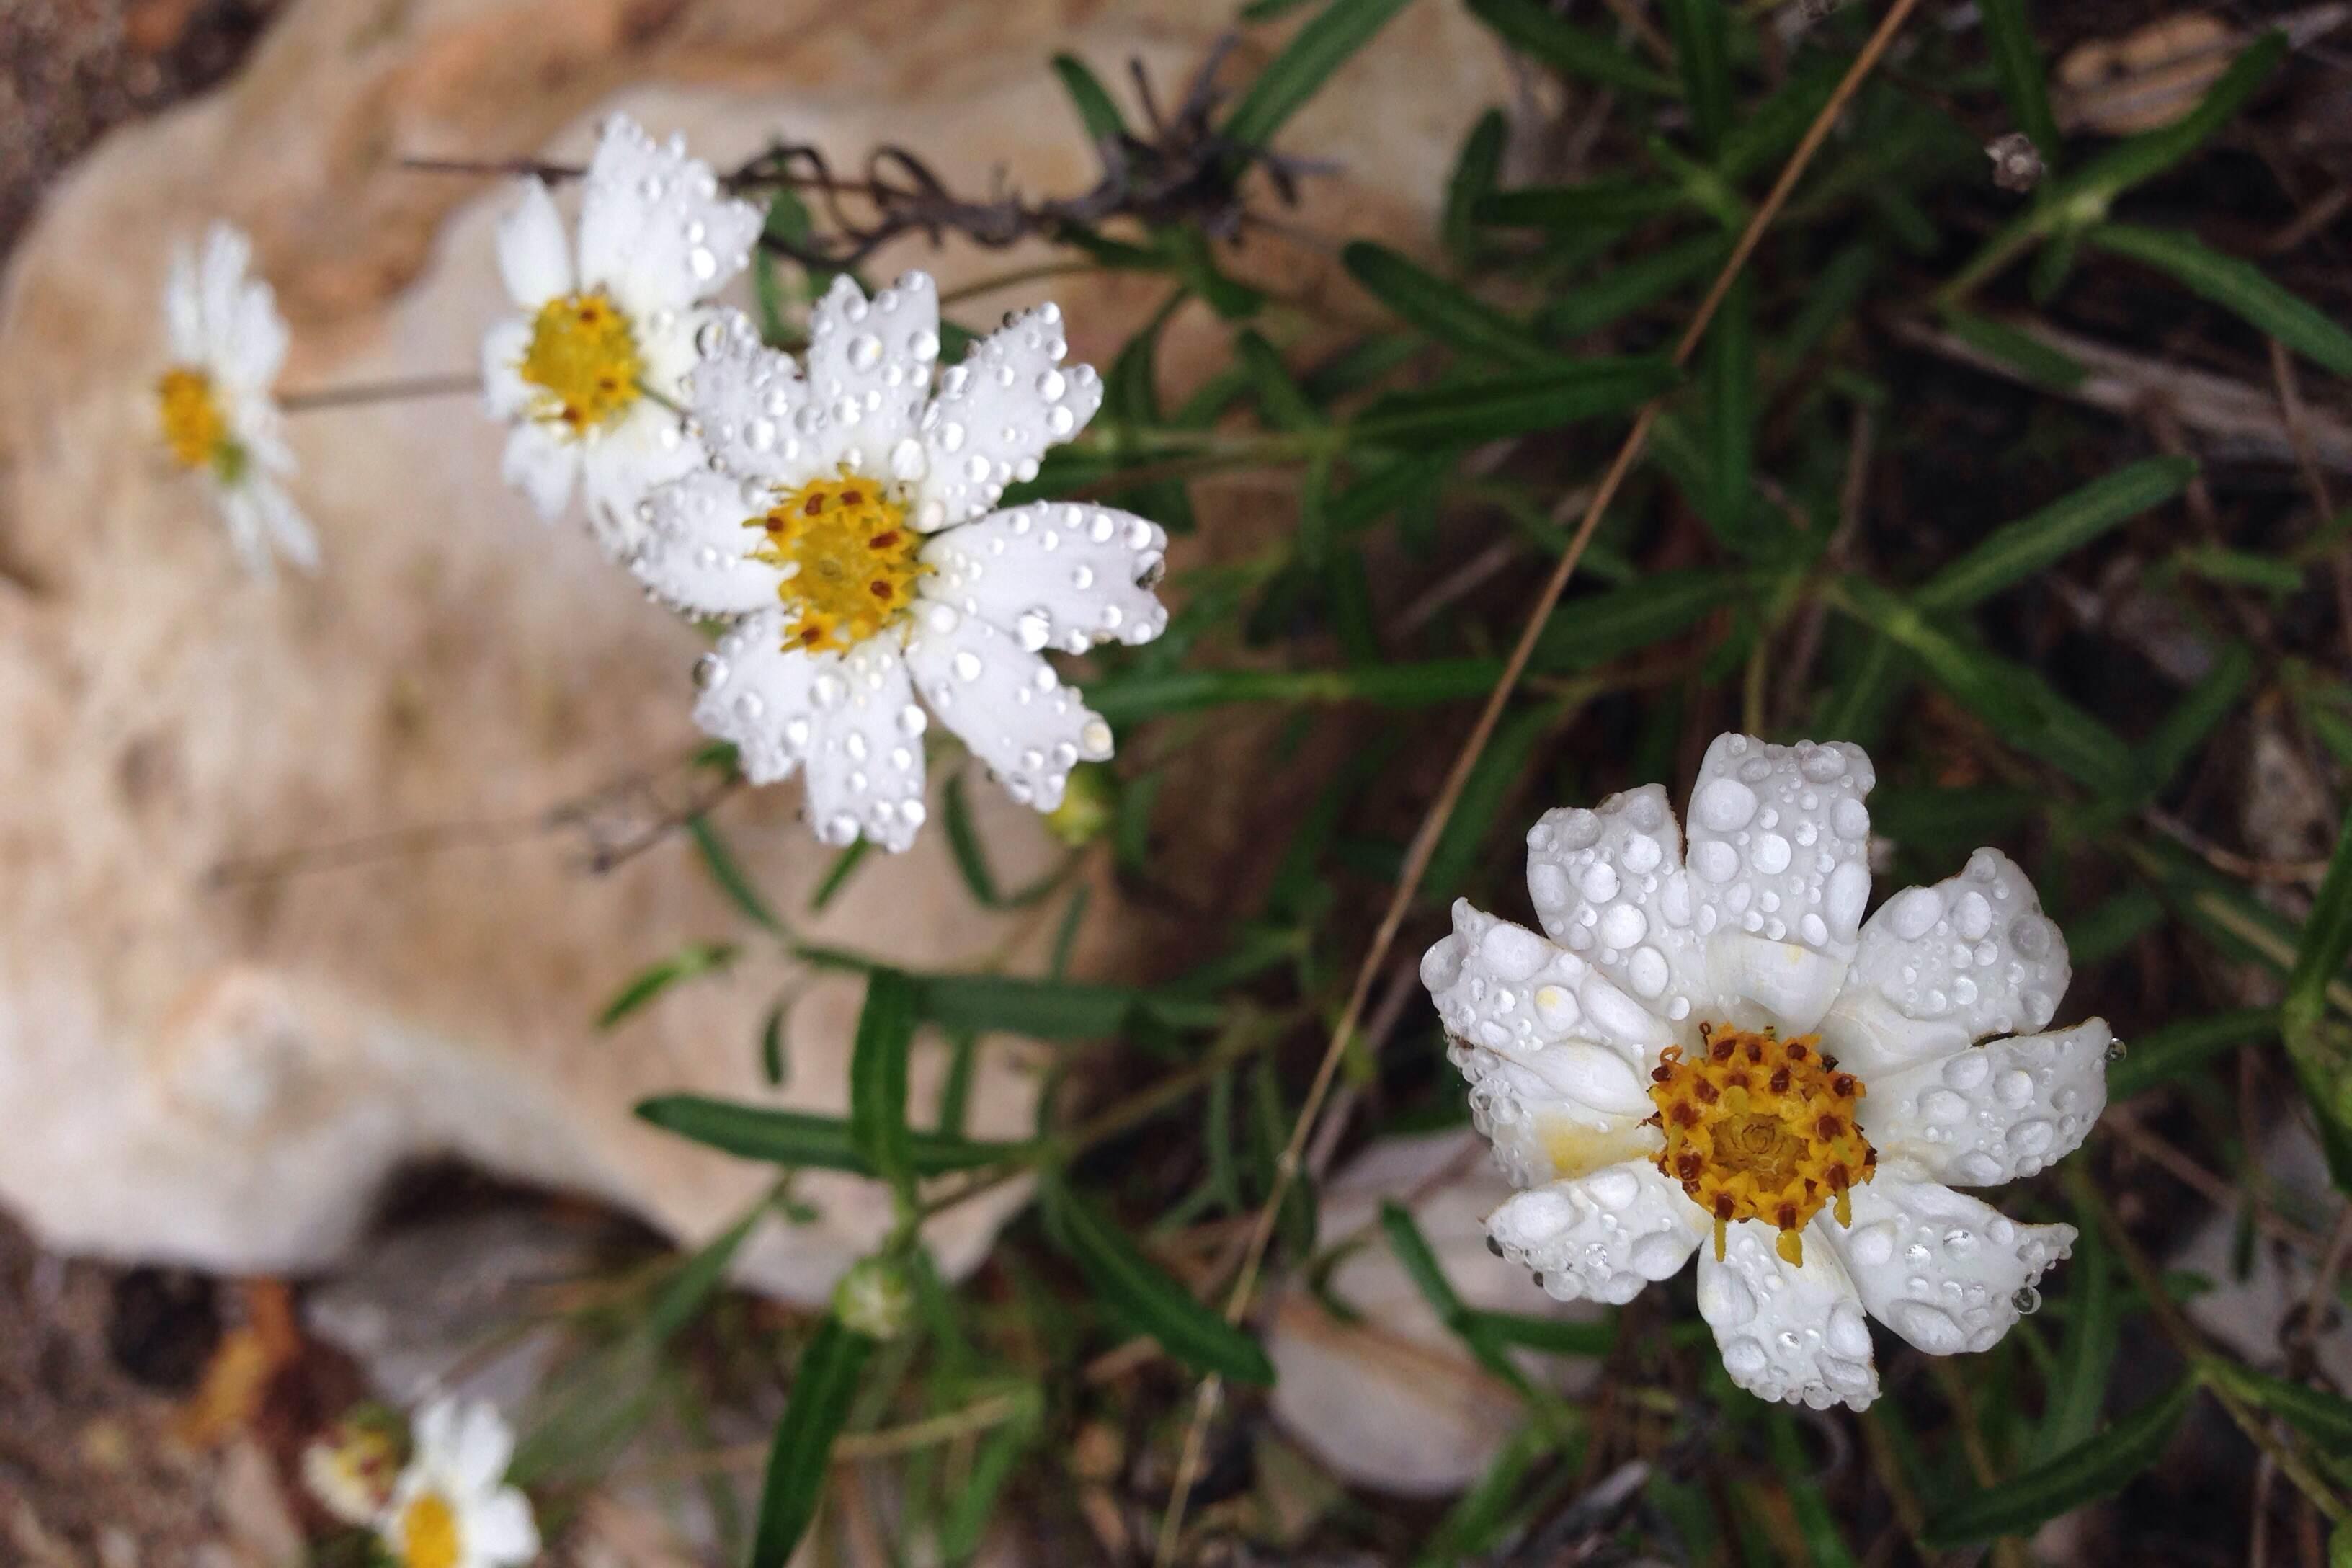 Melampodium leucanthum, Blackfoot daisy